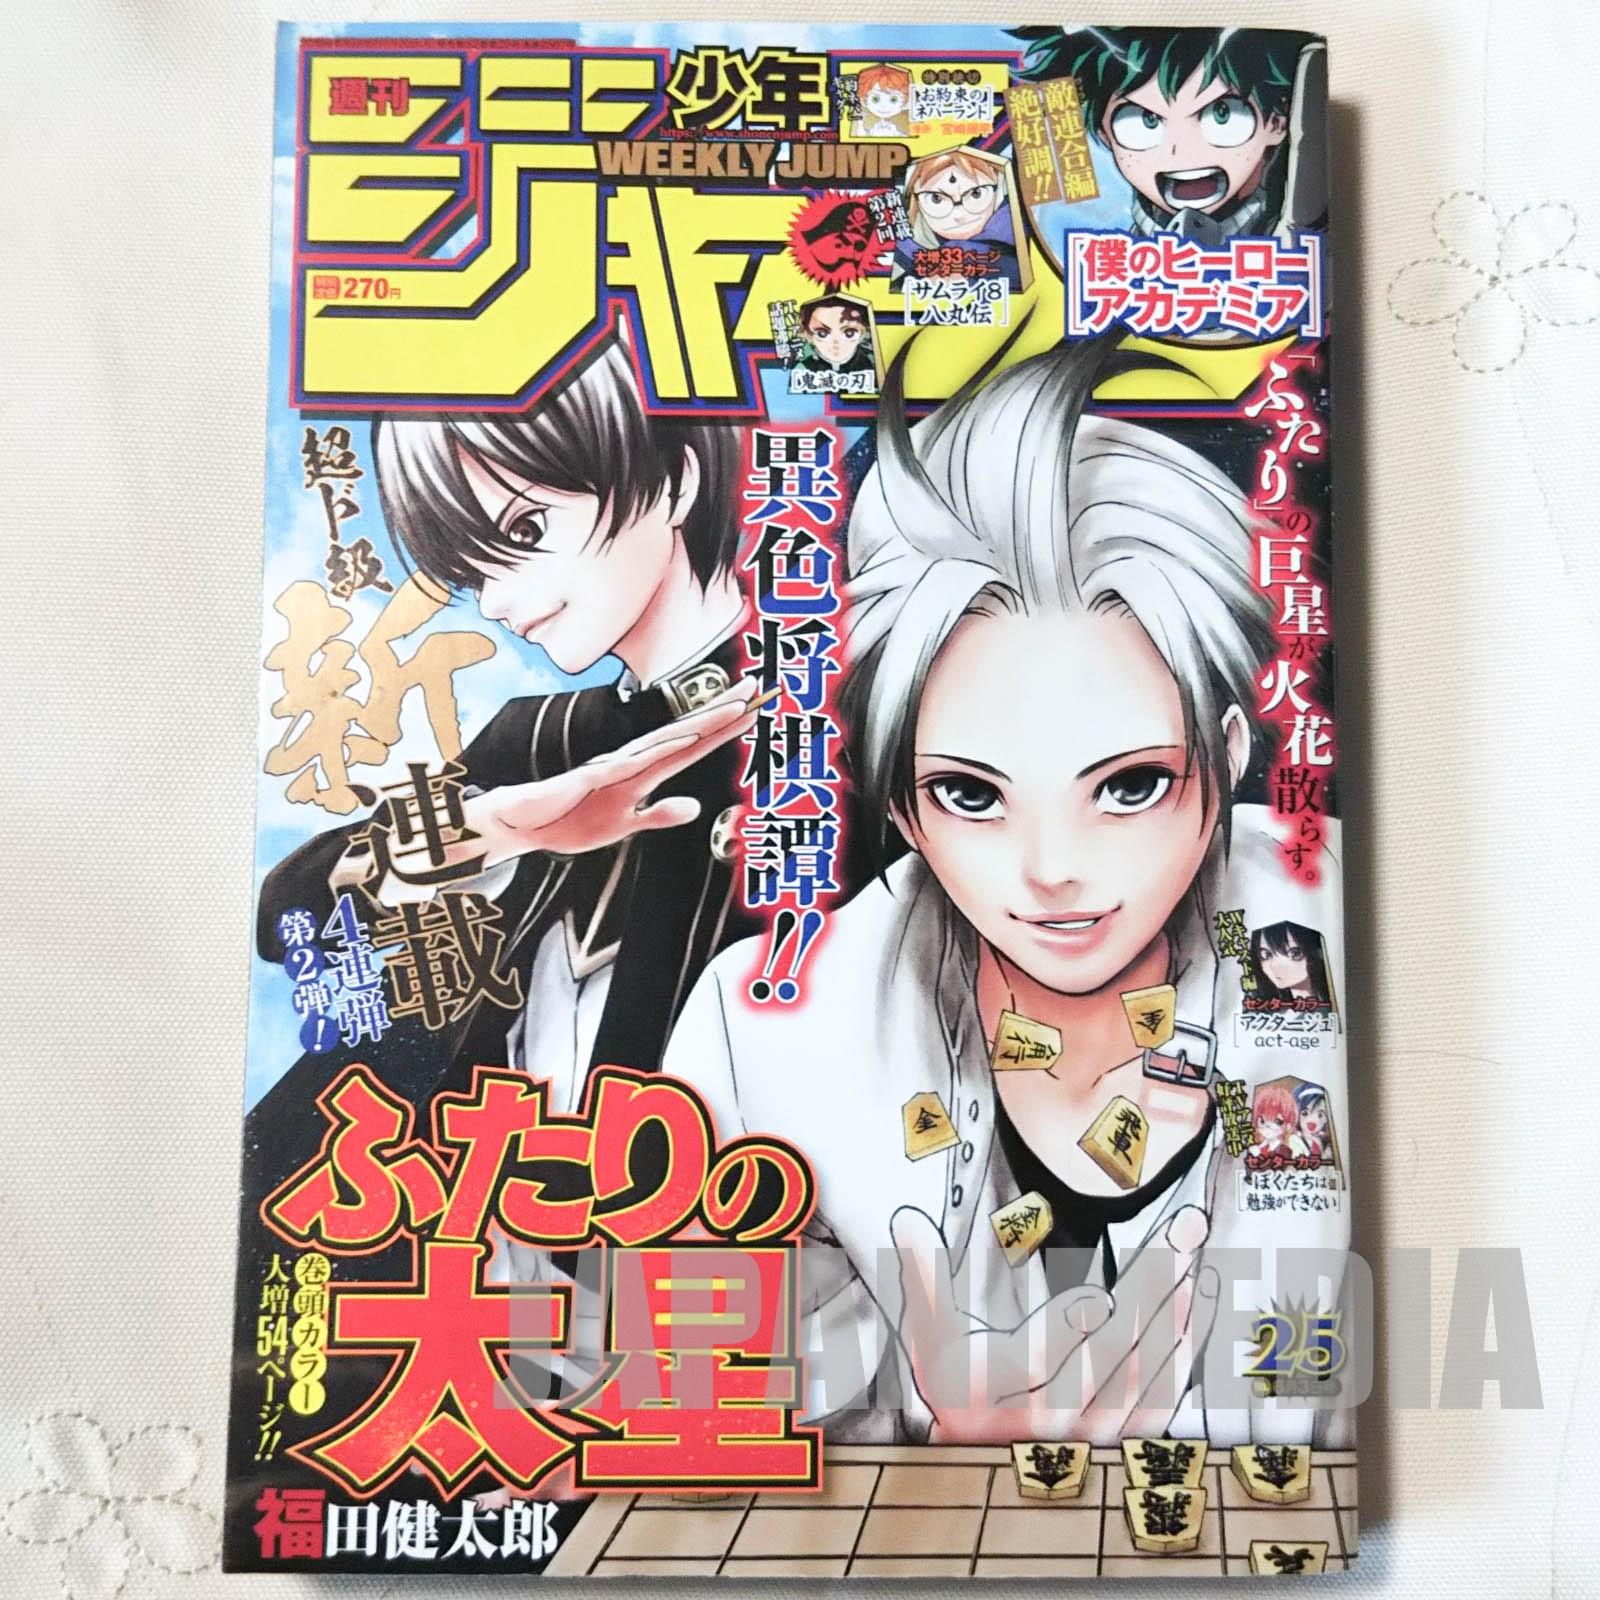 Weekly Shonen JUMP Vol.25 2019 Double Taisei / Japanese Magazine JAPAN MANGA